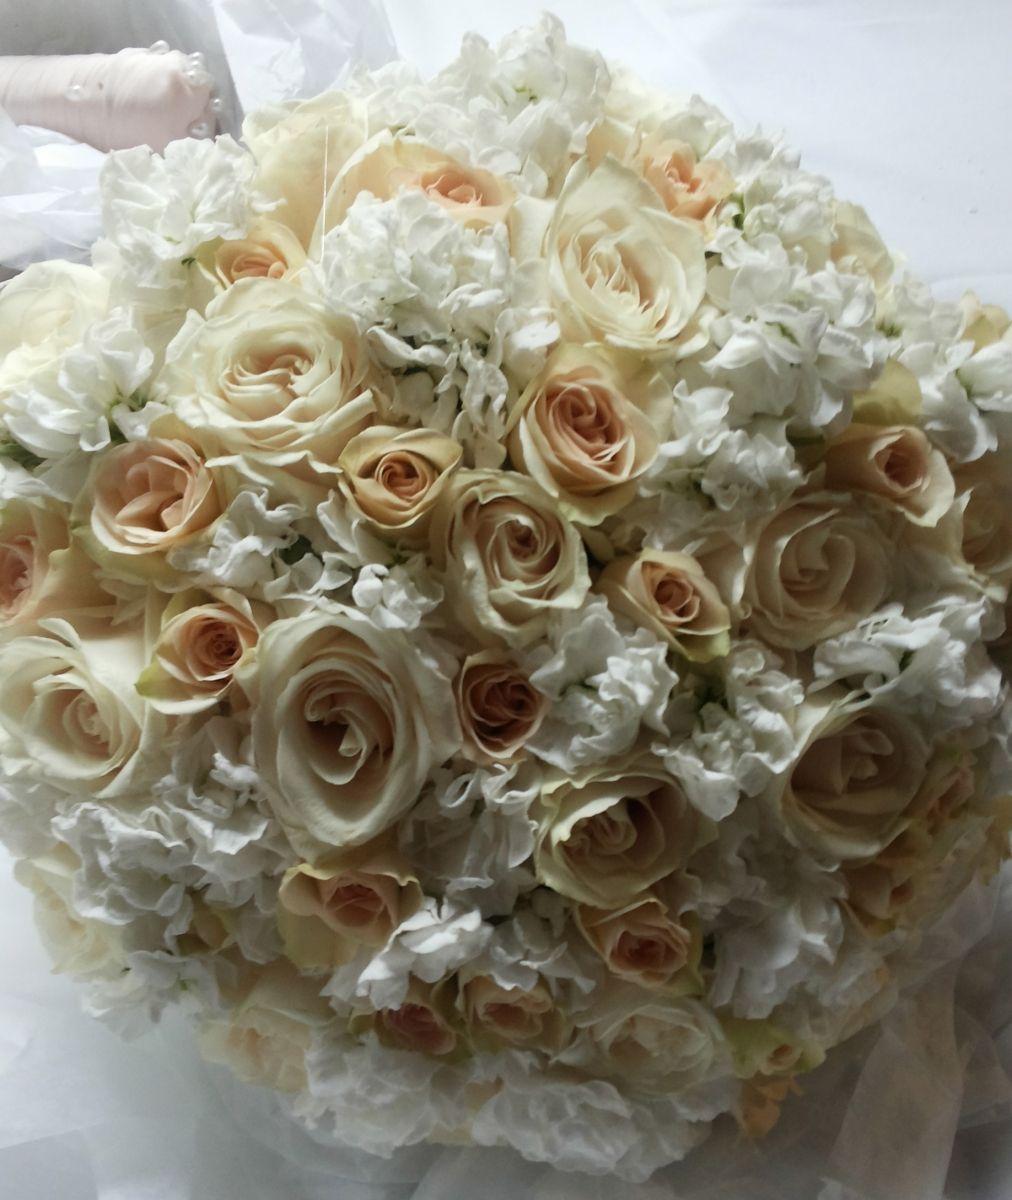 CFD_Blush Bouquets_59